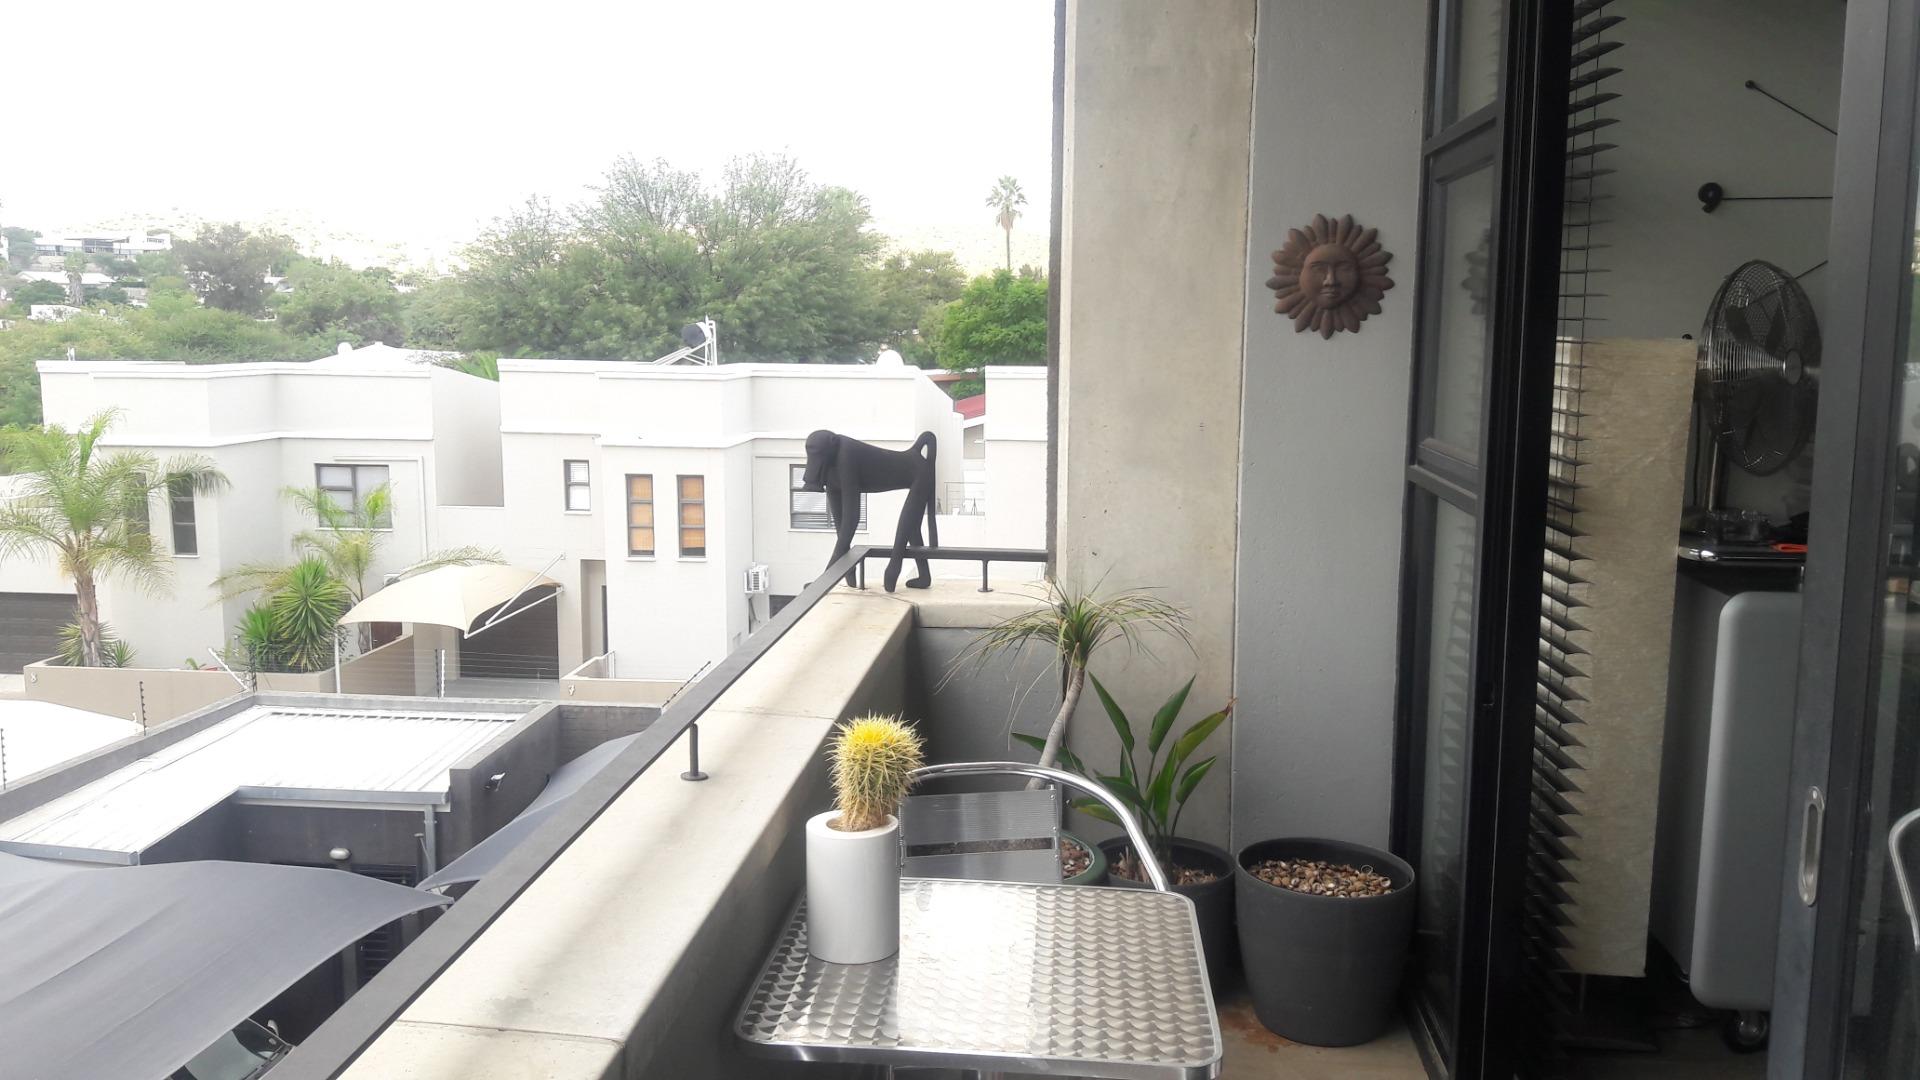 1 Bedroom Apartment / Flat For Sale in Klein Windhoek